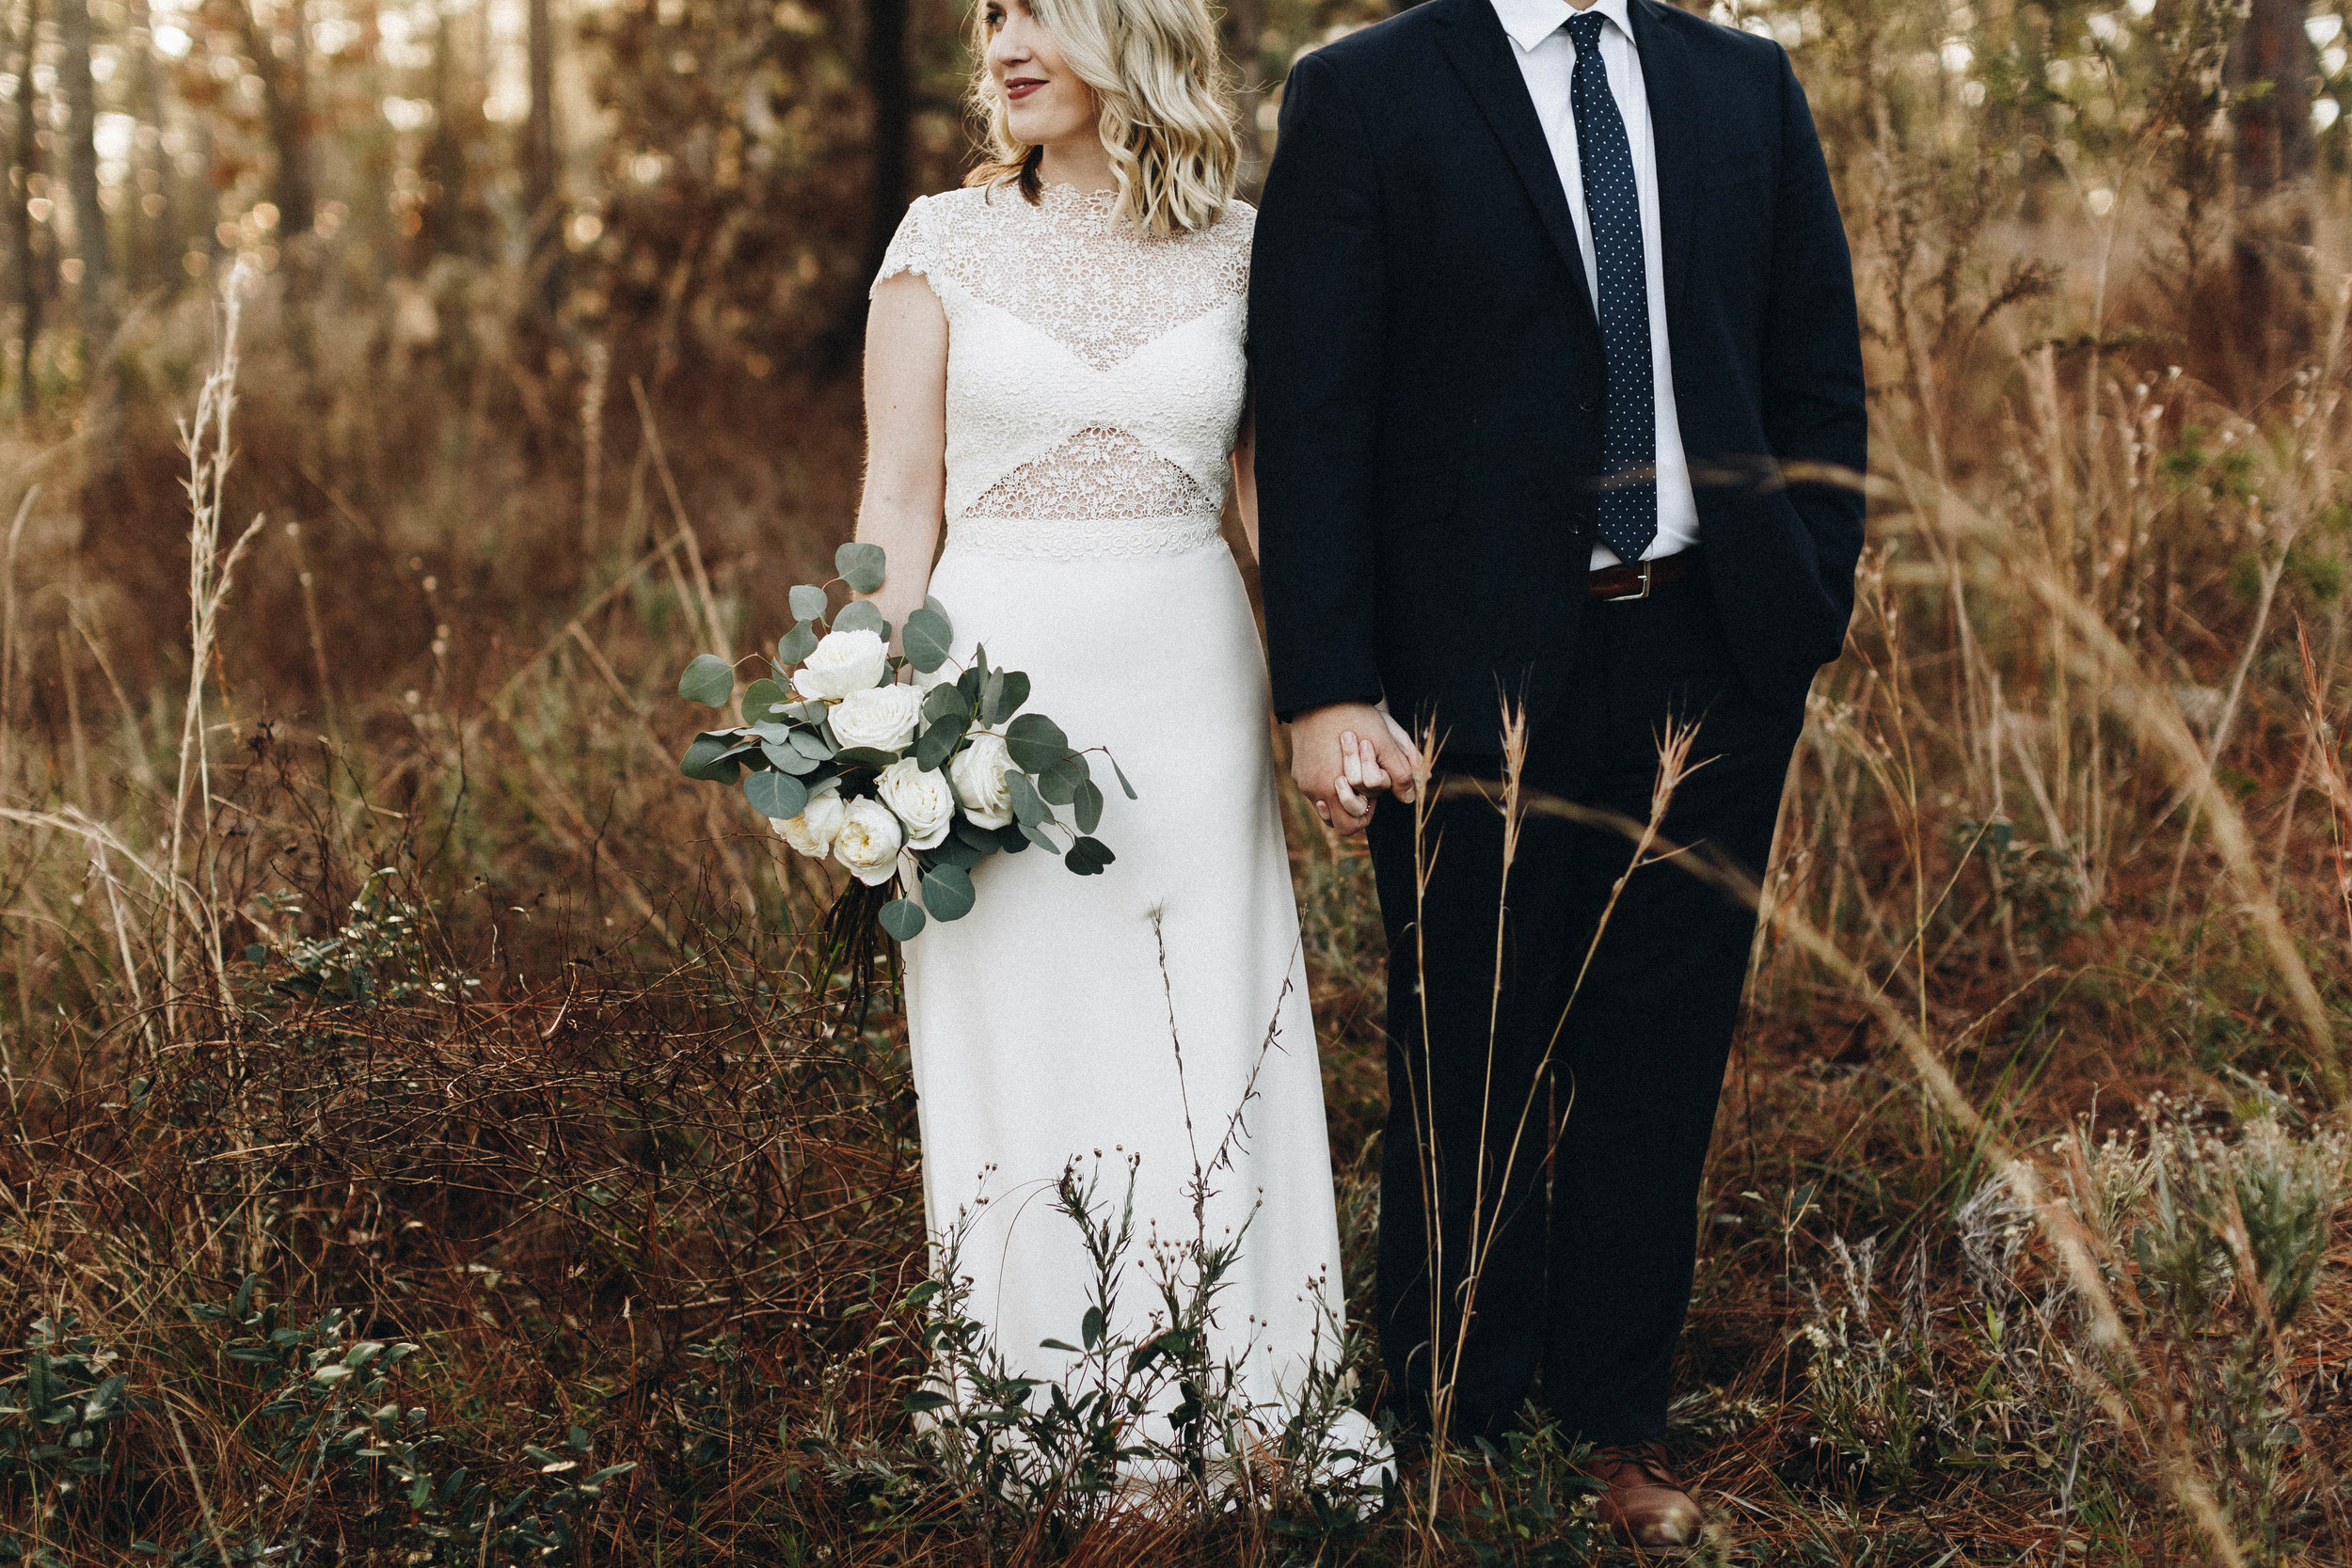 Orlando+wedding+photographer-8.jpeg